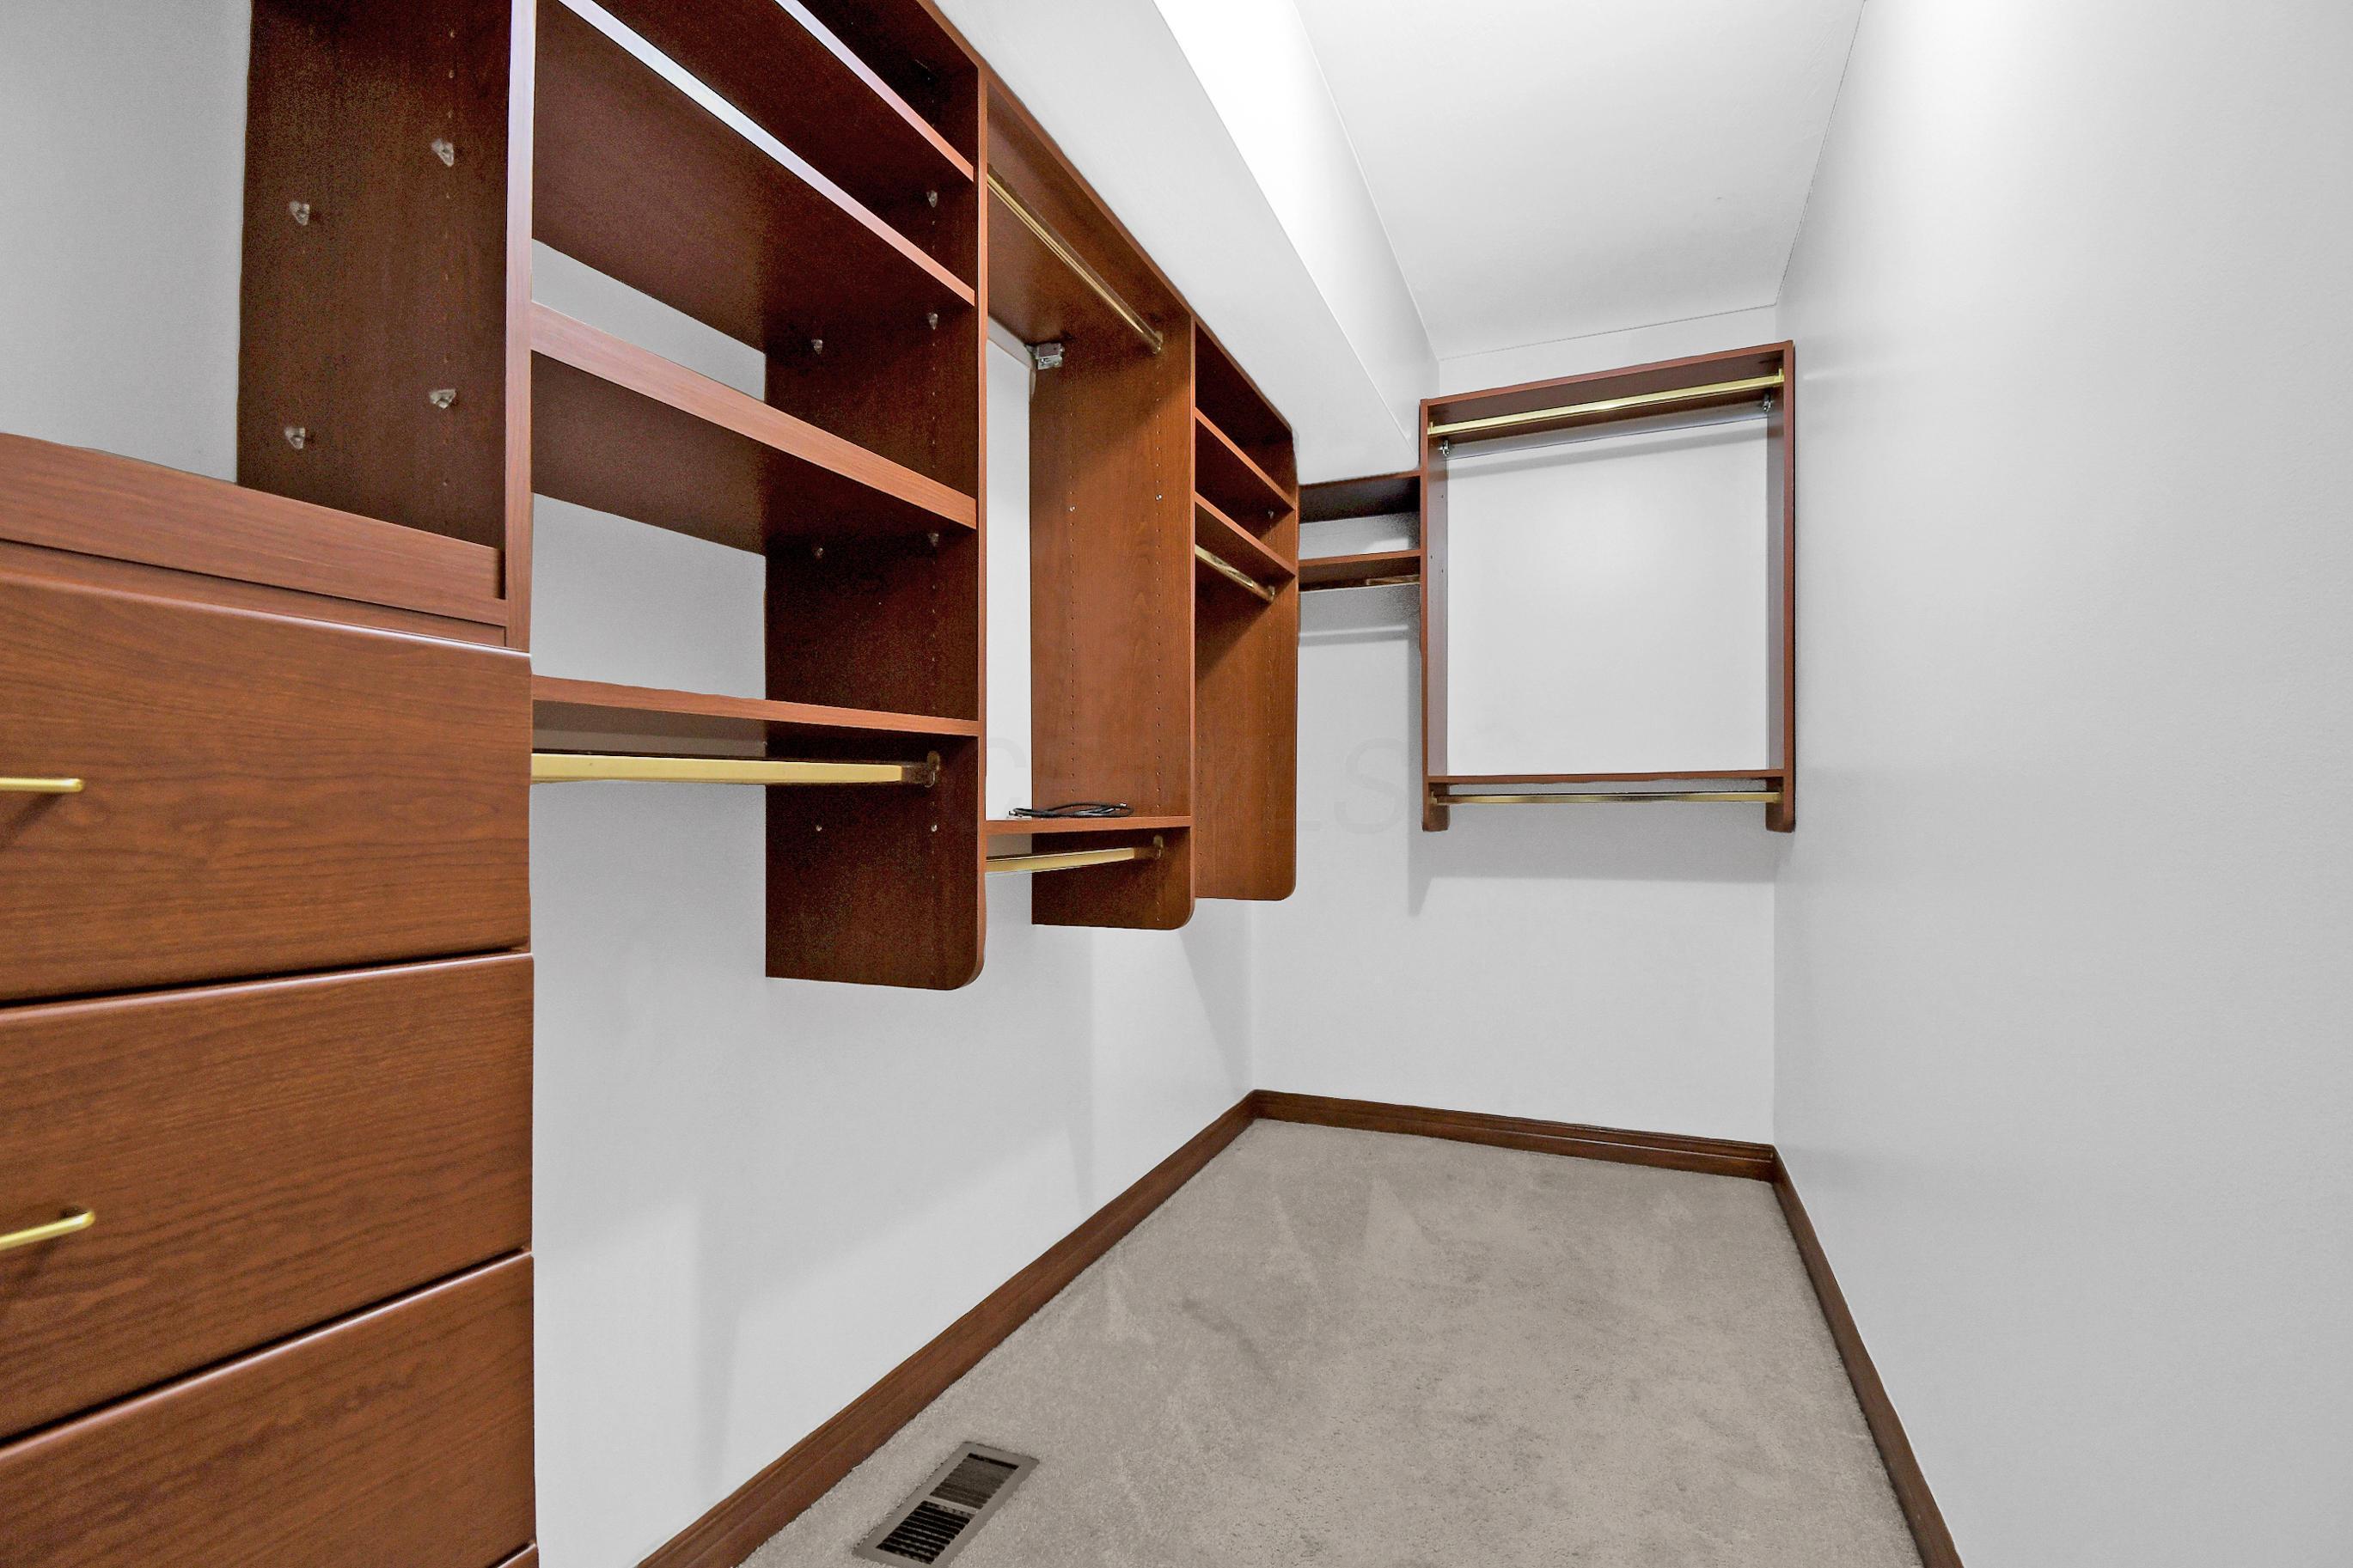 6036 Glenfinnan Court, Dublin, Ohio 43017, 4 Bedrooms Bedrooms, ,5 BathroomsBathrooms,Residential,For Sale,Glenfinnan,220018622